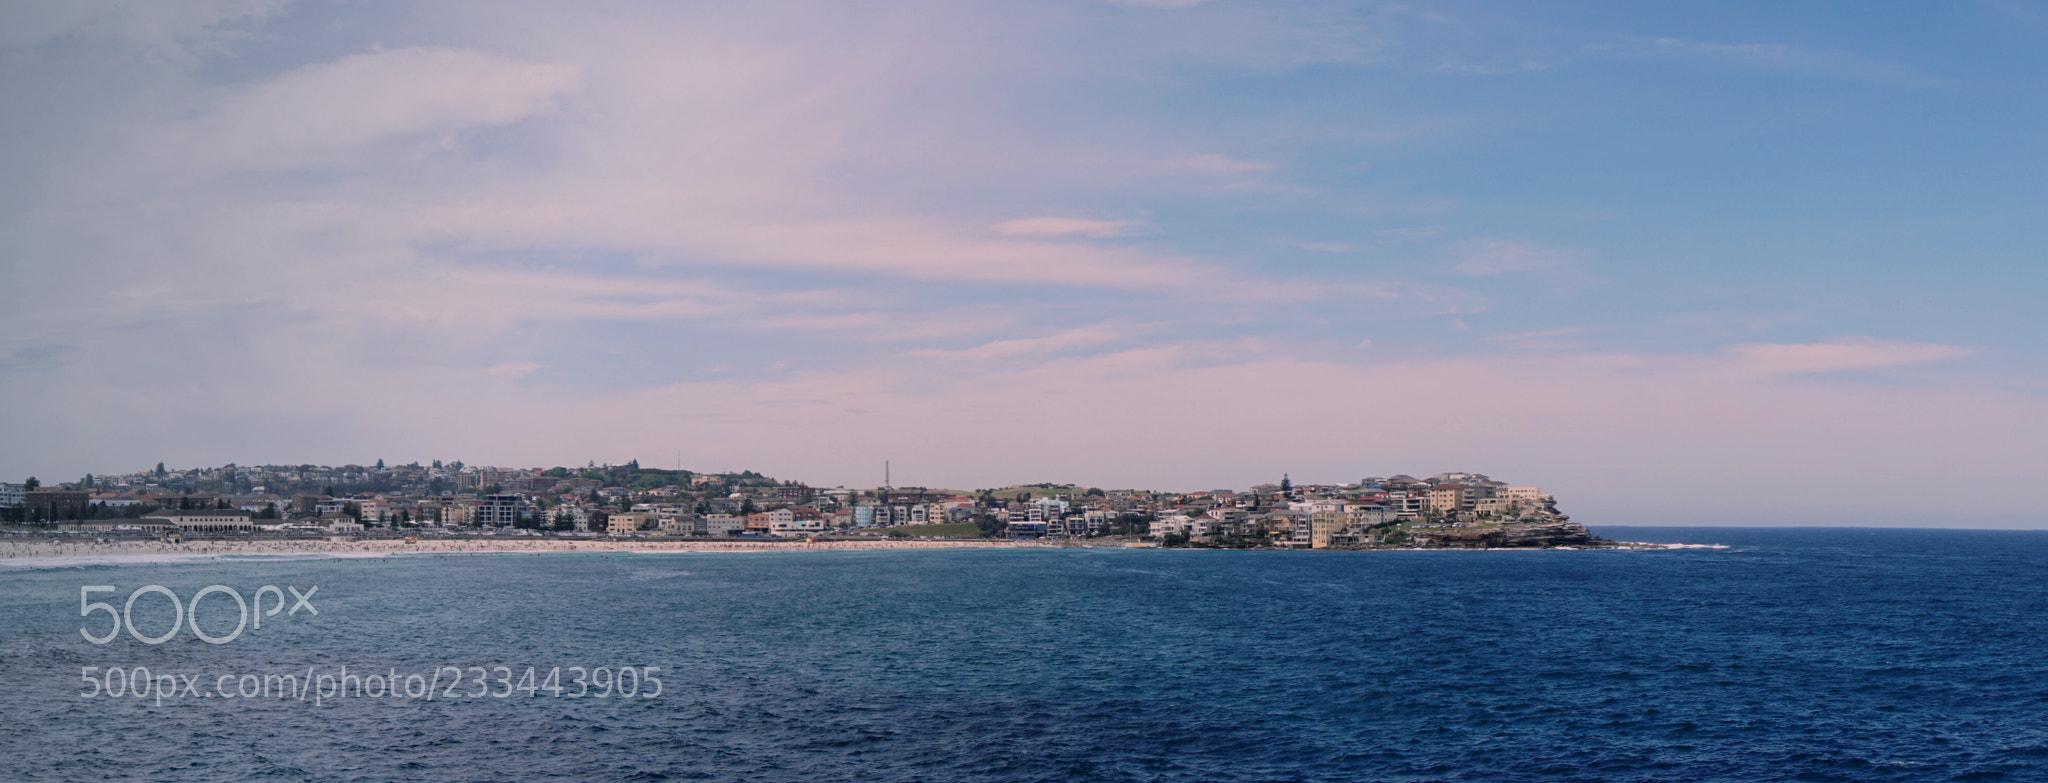 Bondi Beach Coastline